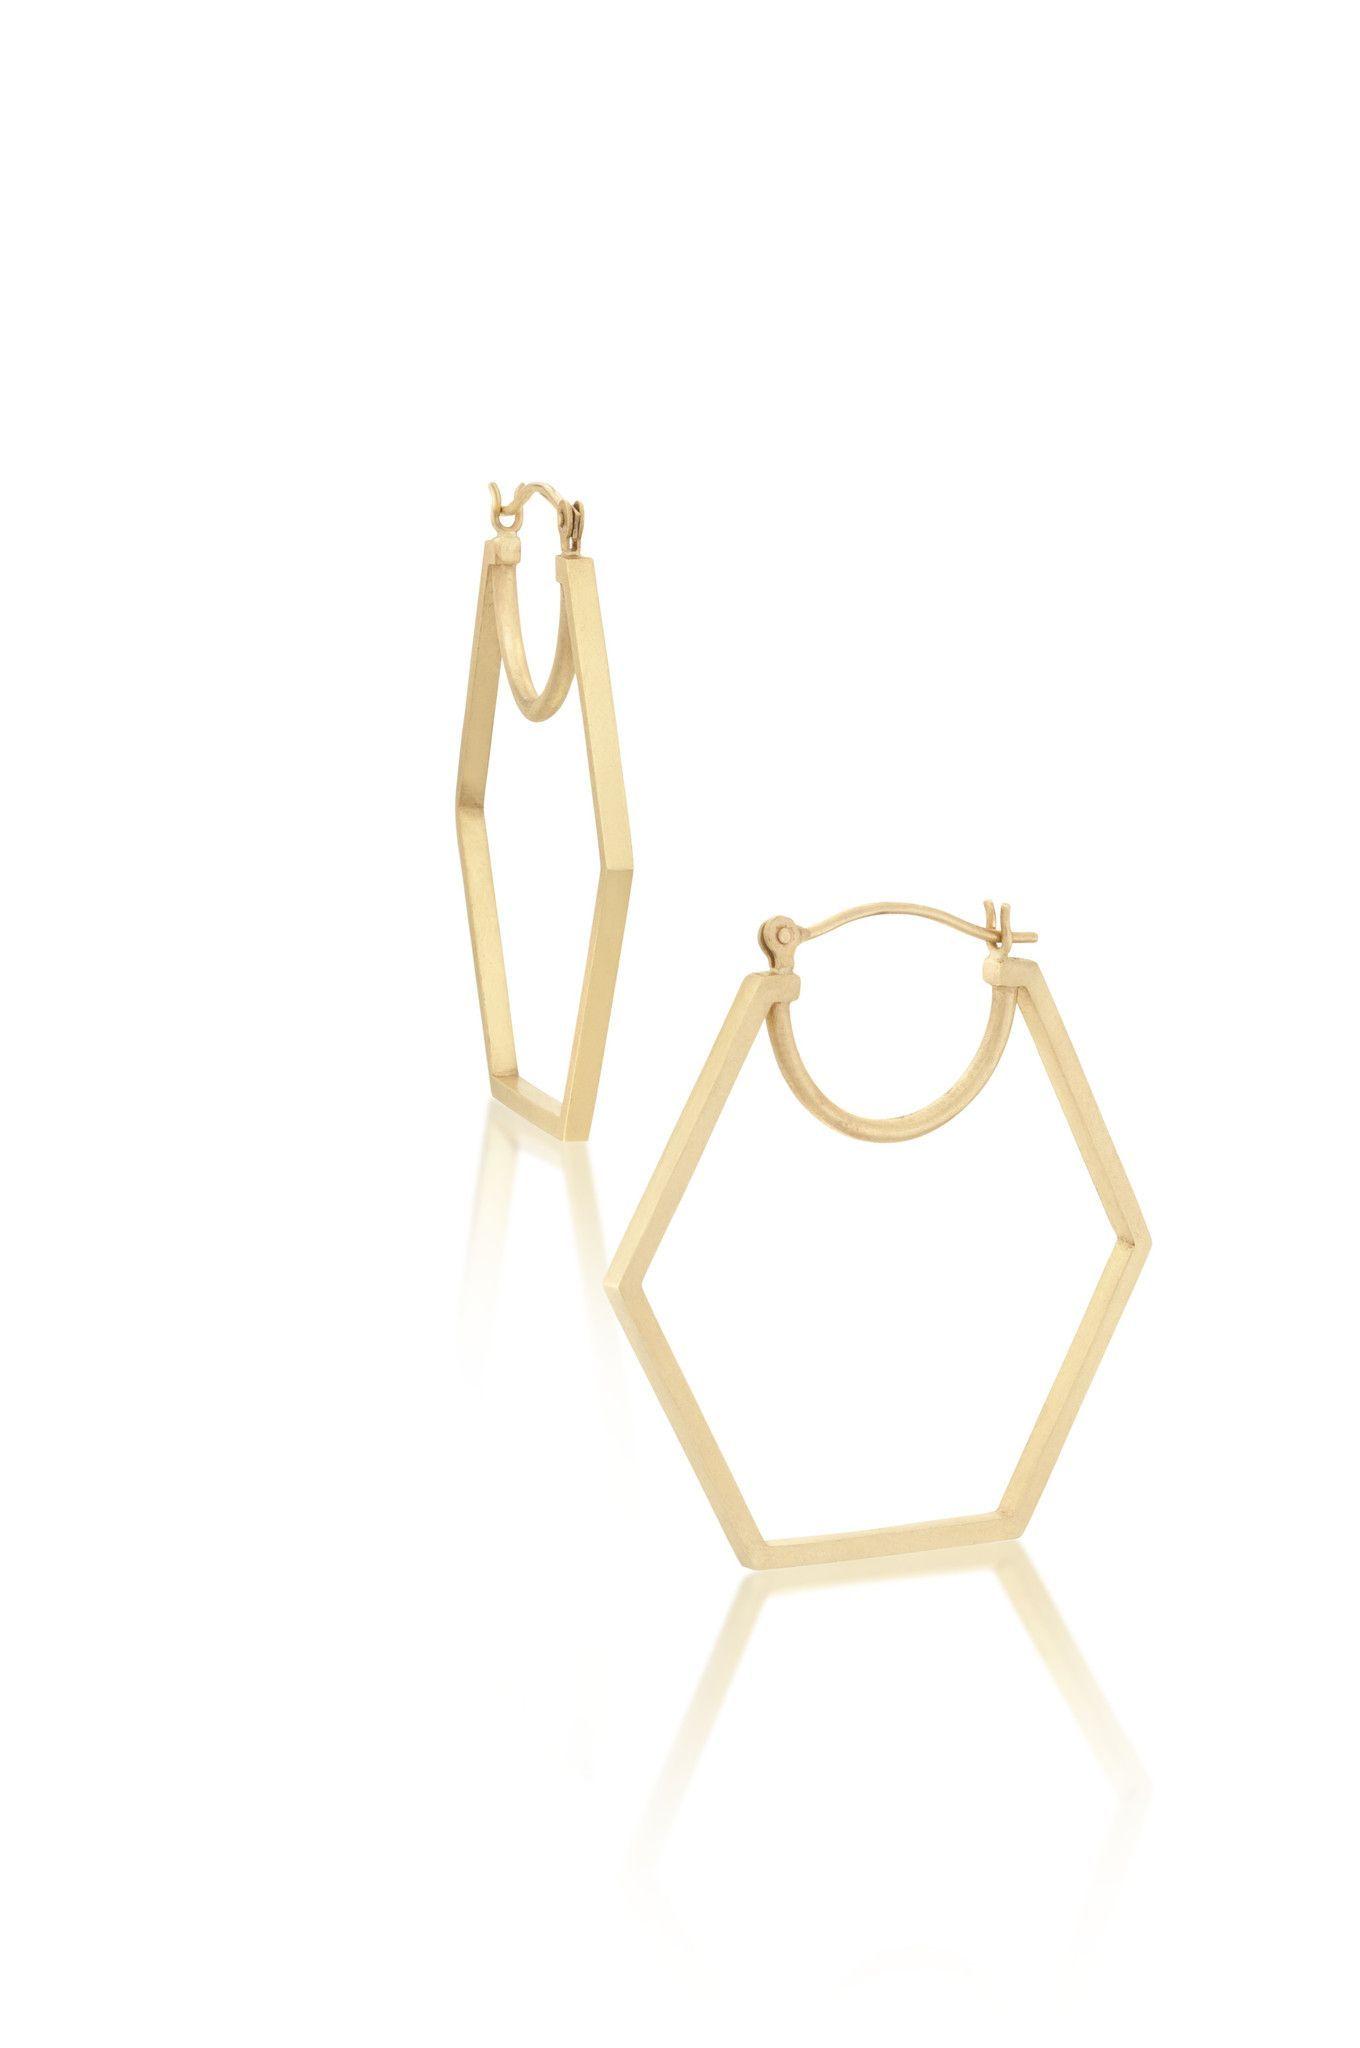 14k Gold Hexagon Hoop Earrings